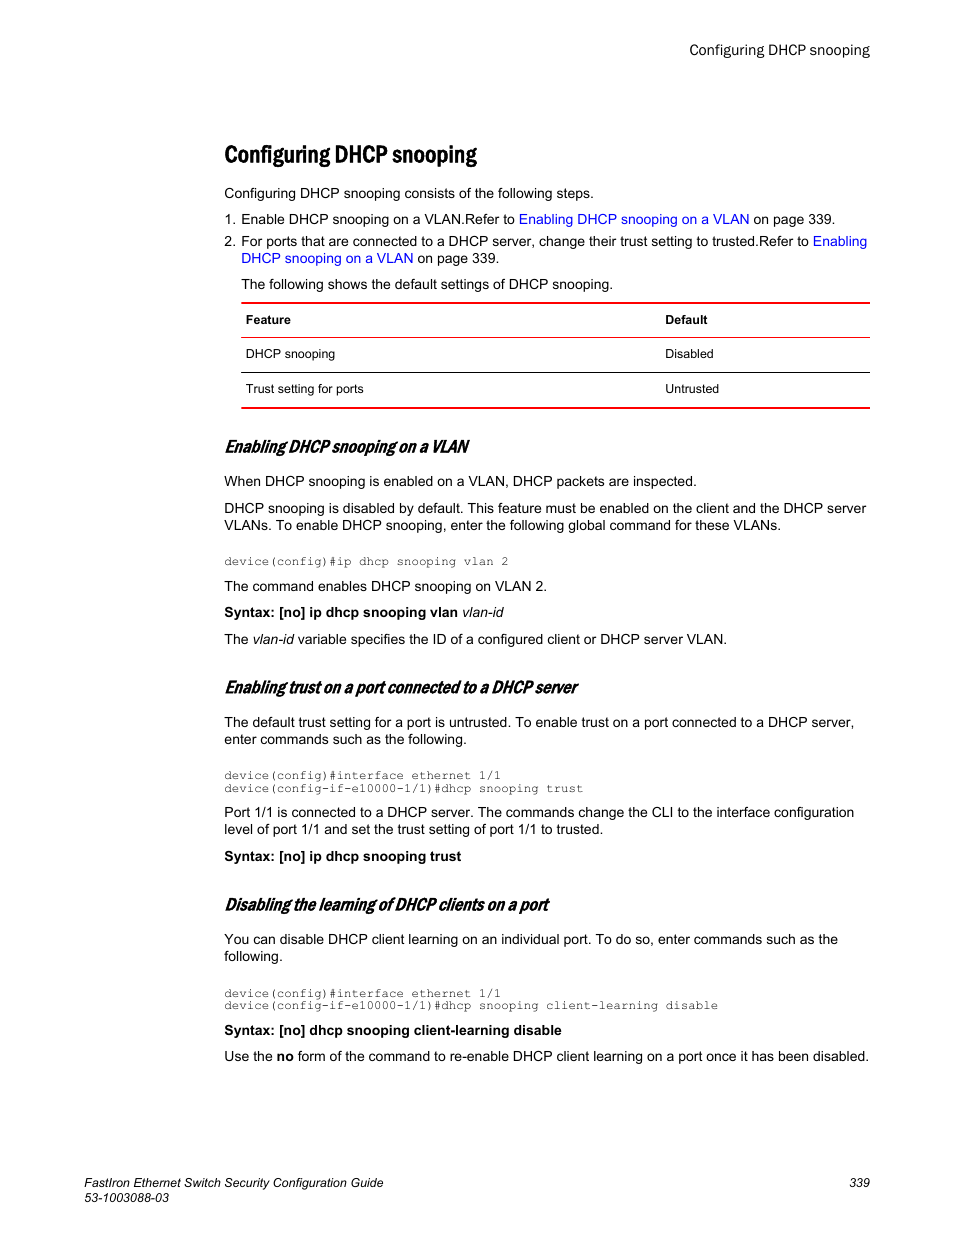 Configuring dhcp snooping, Enabling dhcp snooping on a vlan